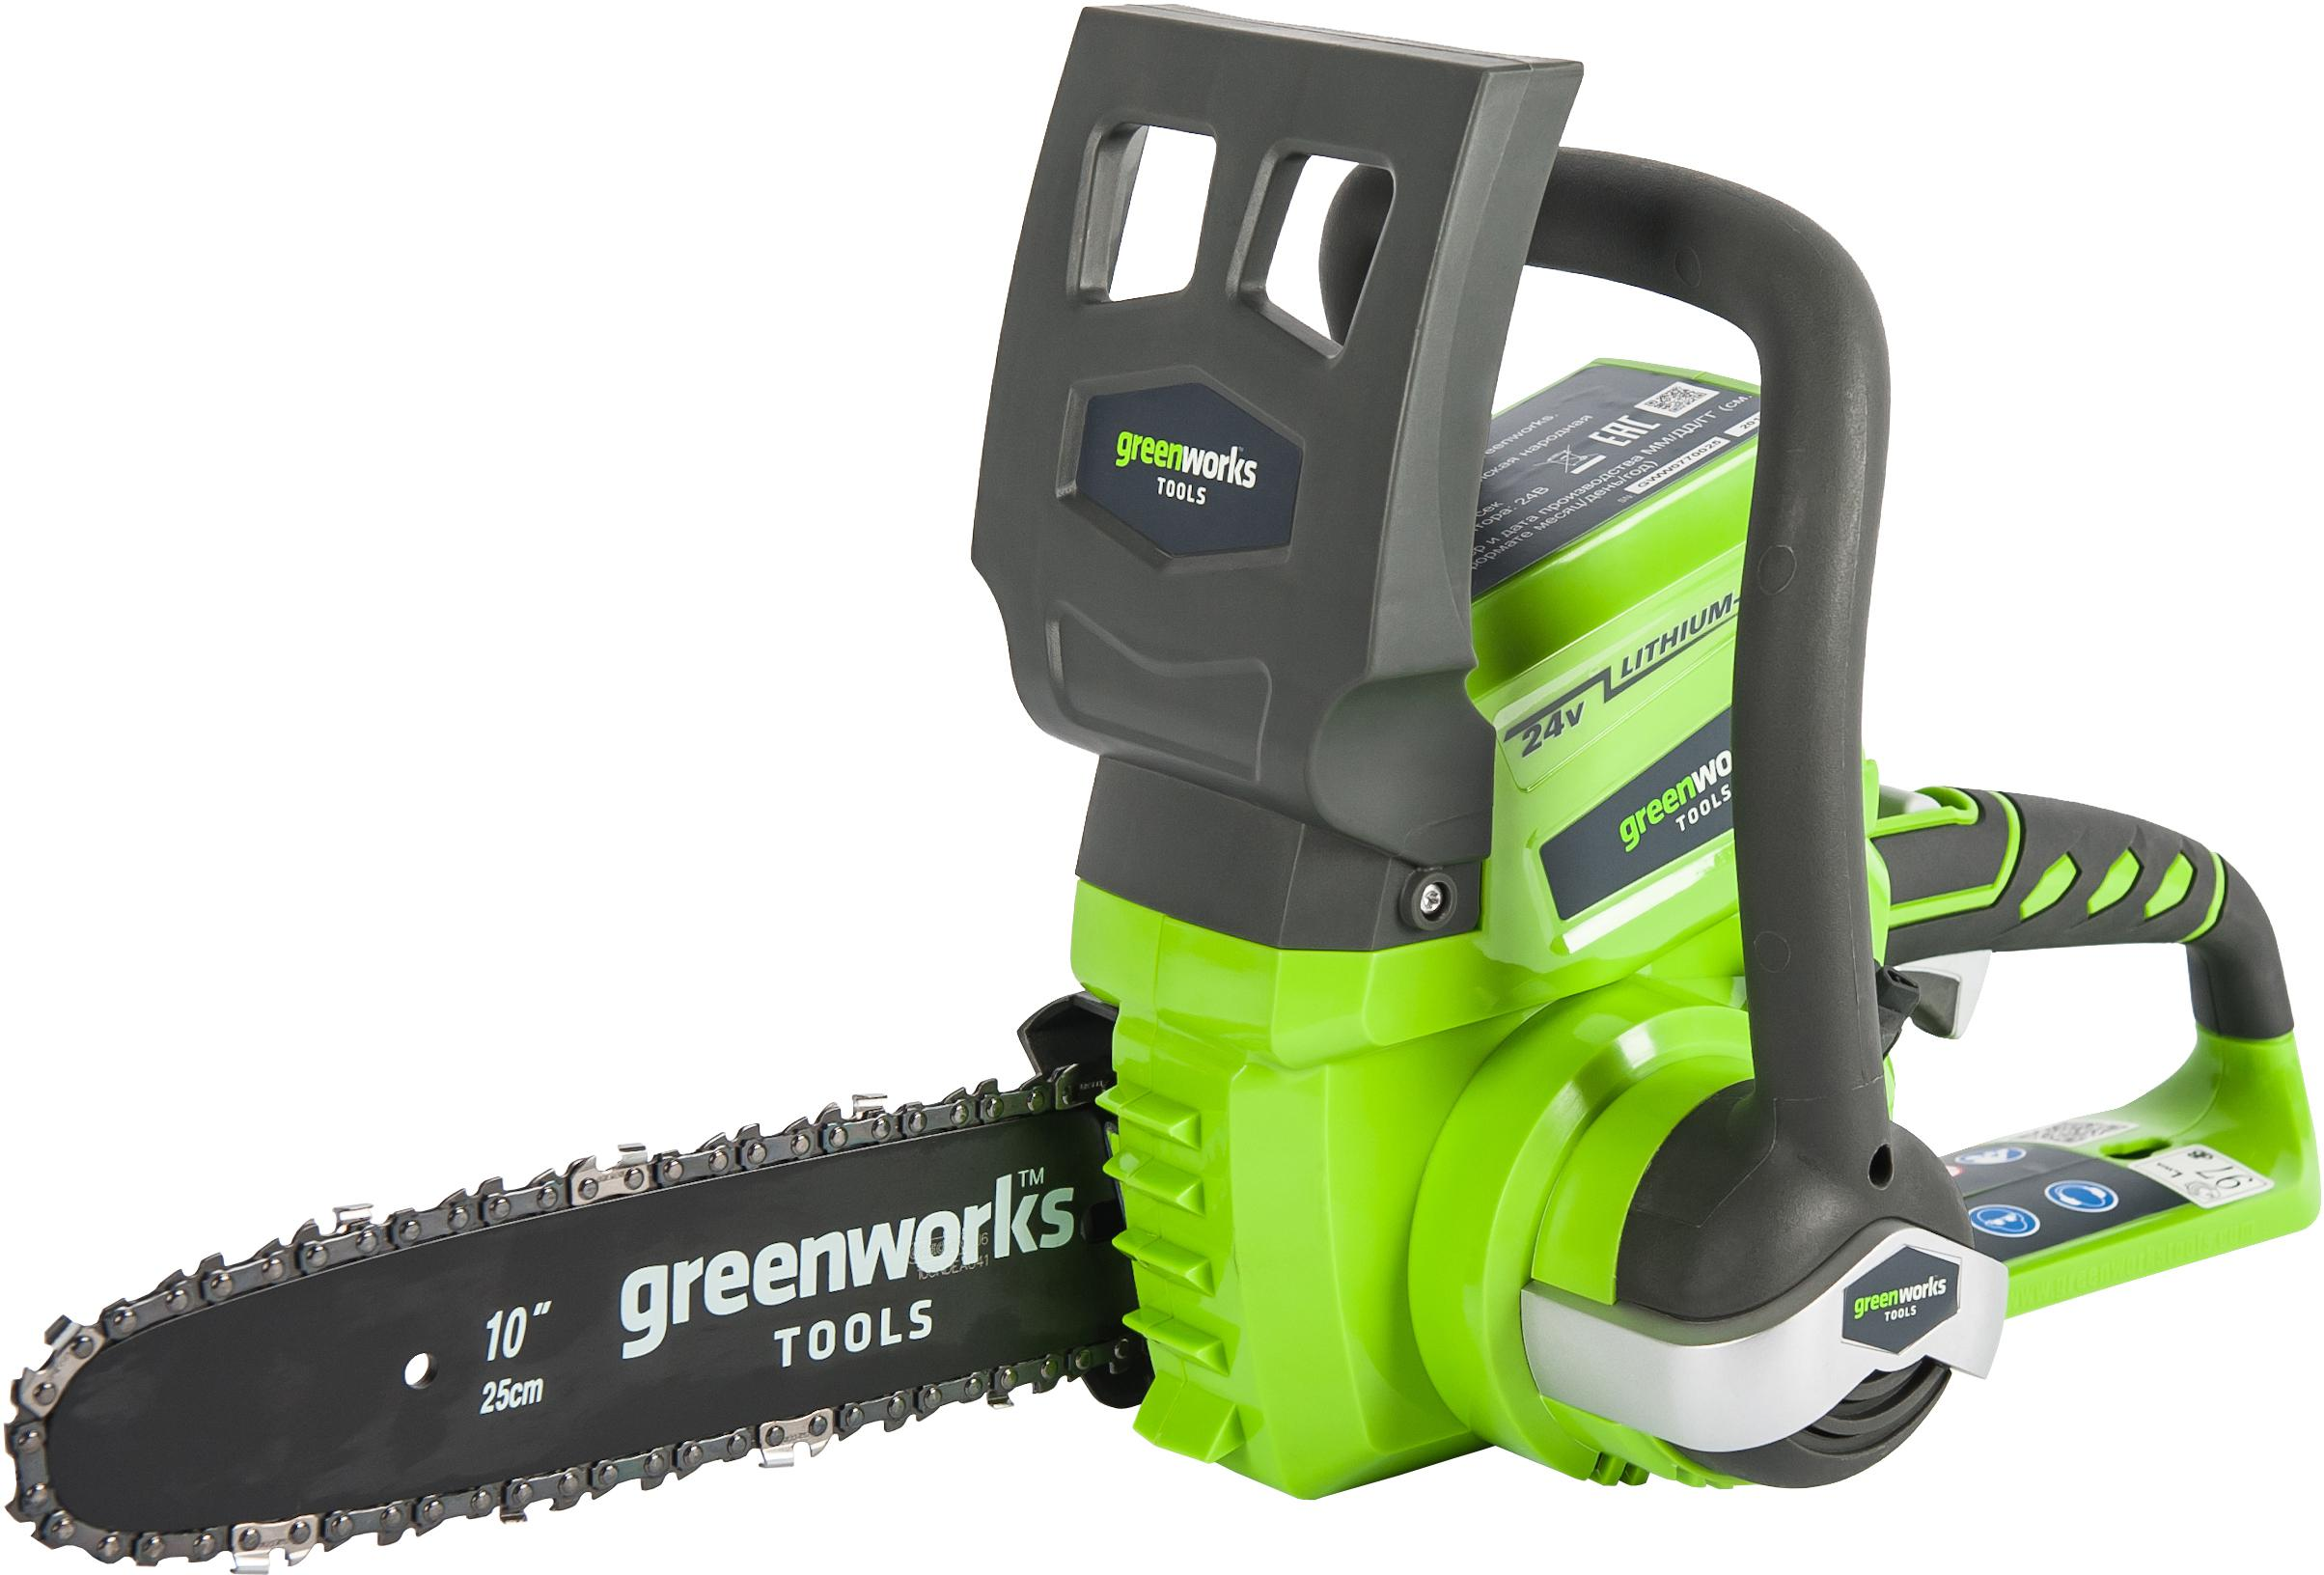 Пила цепная аккумуляторная Greenworks G24cs25 (2000007) БЕЗ АККУМ и ЗУ пила цепная аккумуляторная greenworks gd60cs40 2001807 без аккум и зу